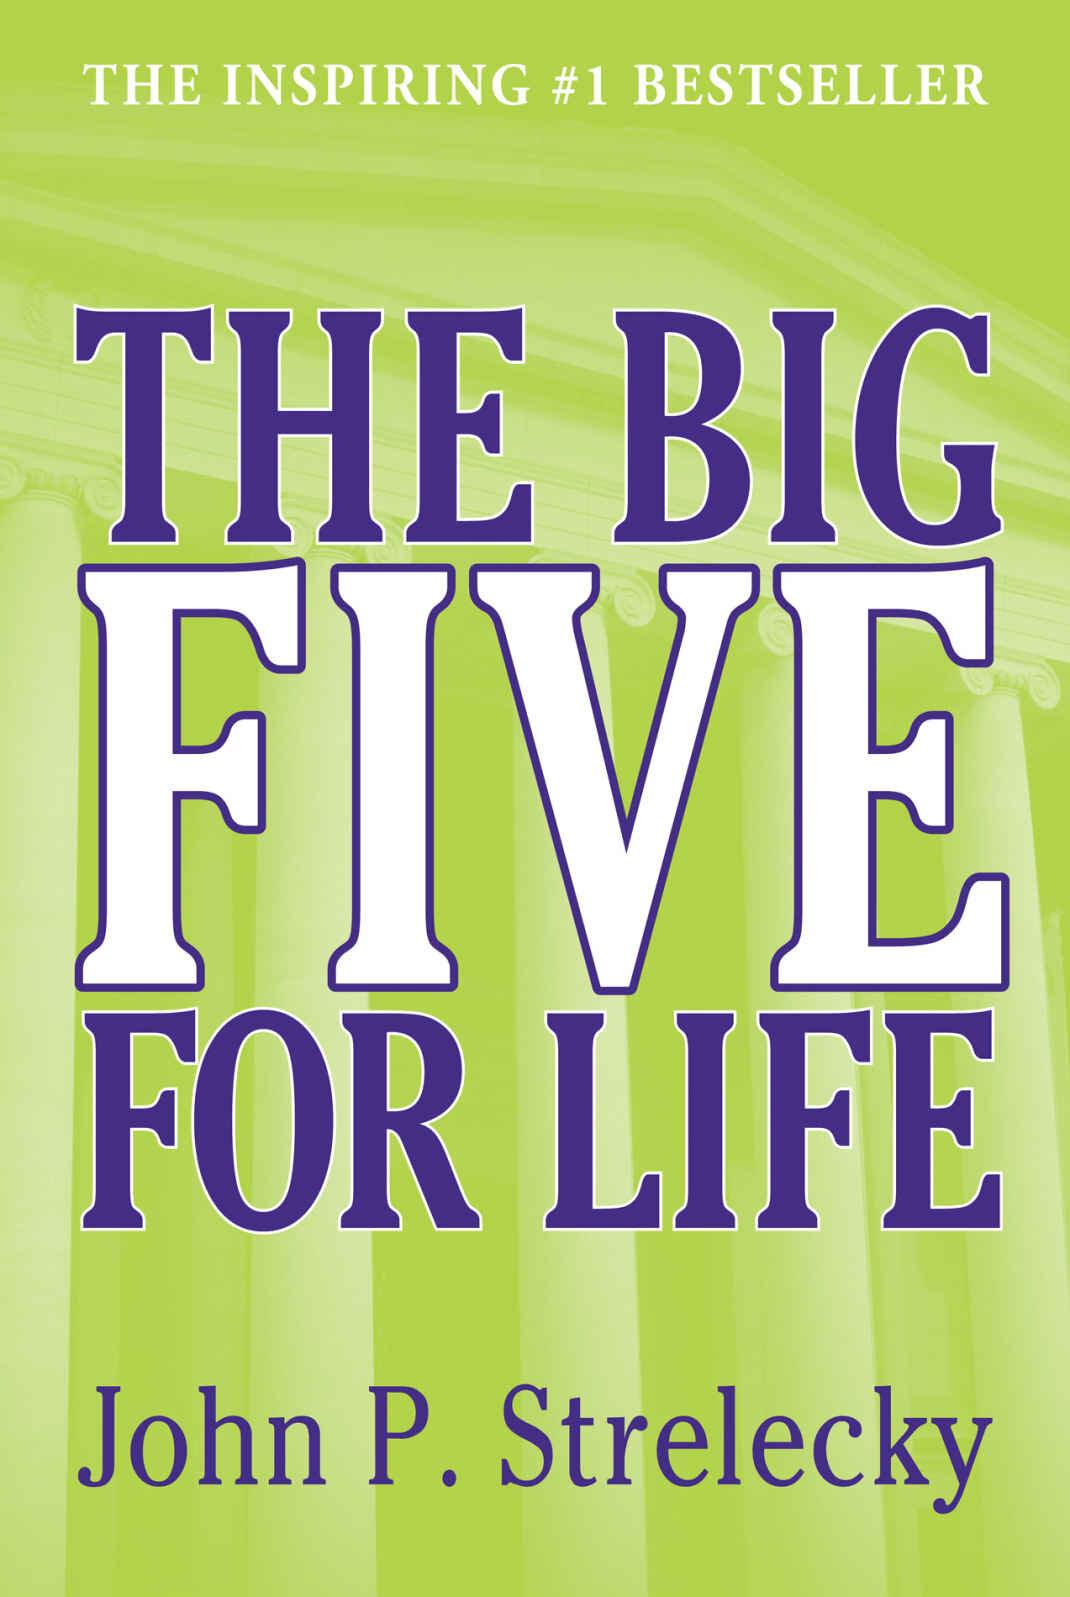 minimalray-minimalist-the-big-five-for-life.jpeg